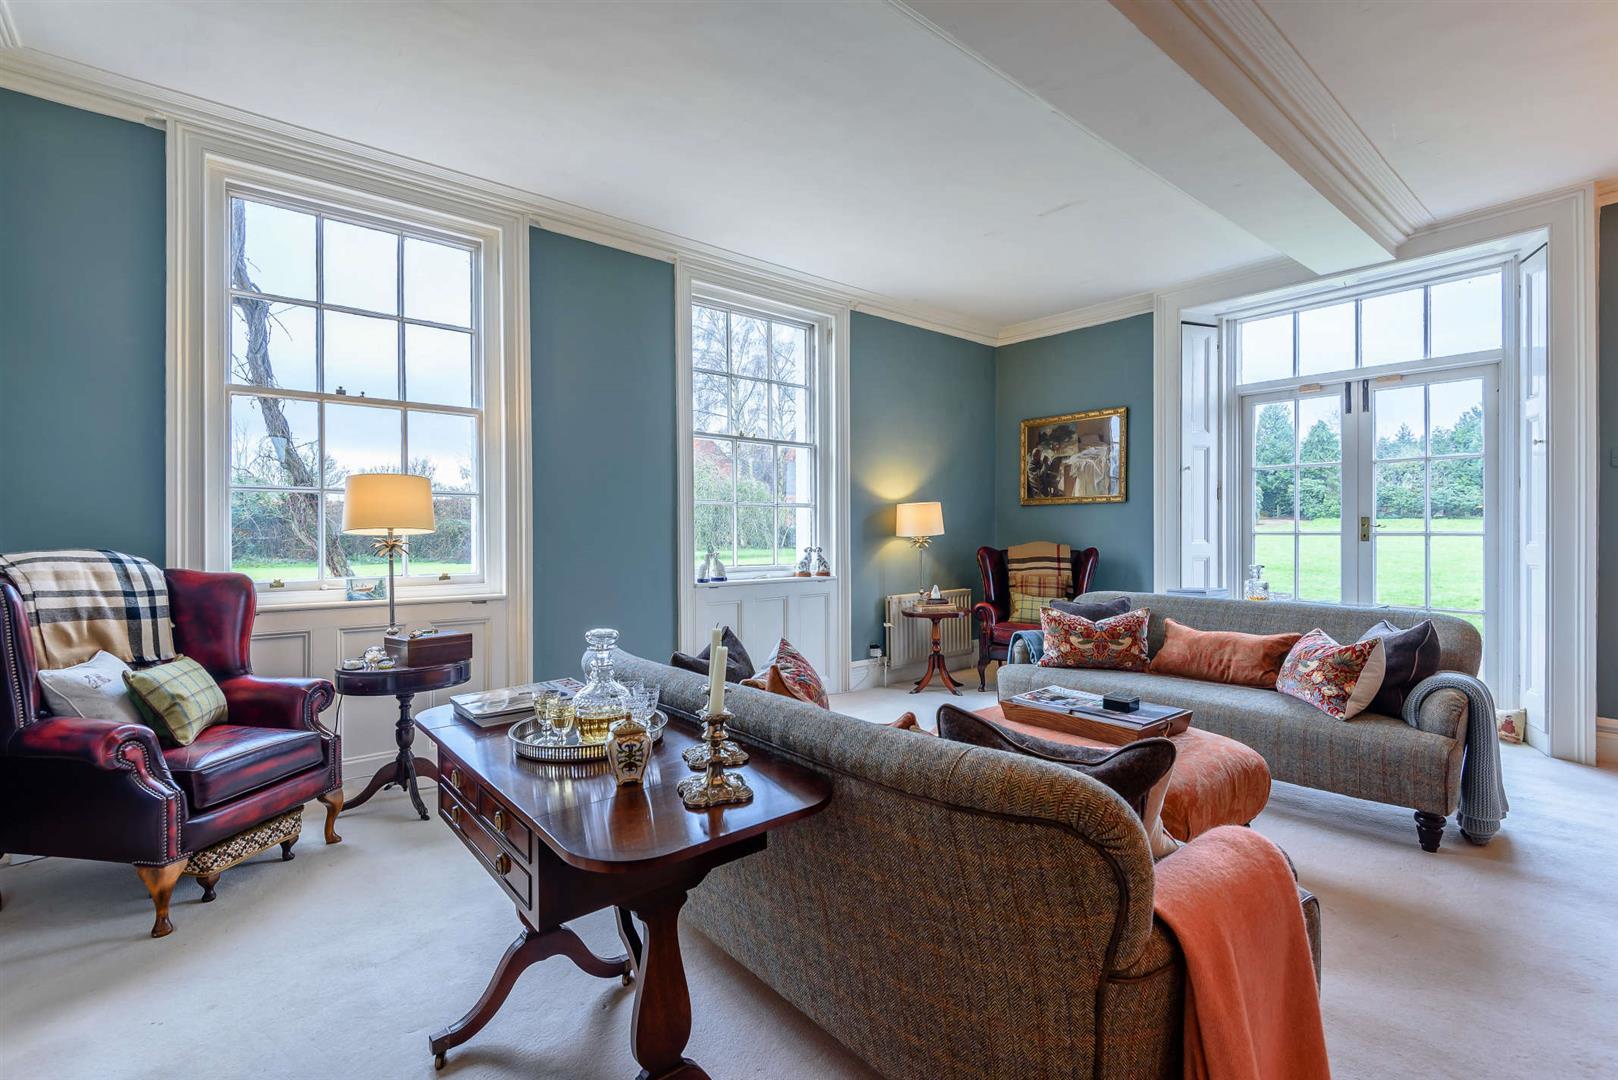 Grade II Listed Georgian Manor House drawing room symmetrical interior